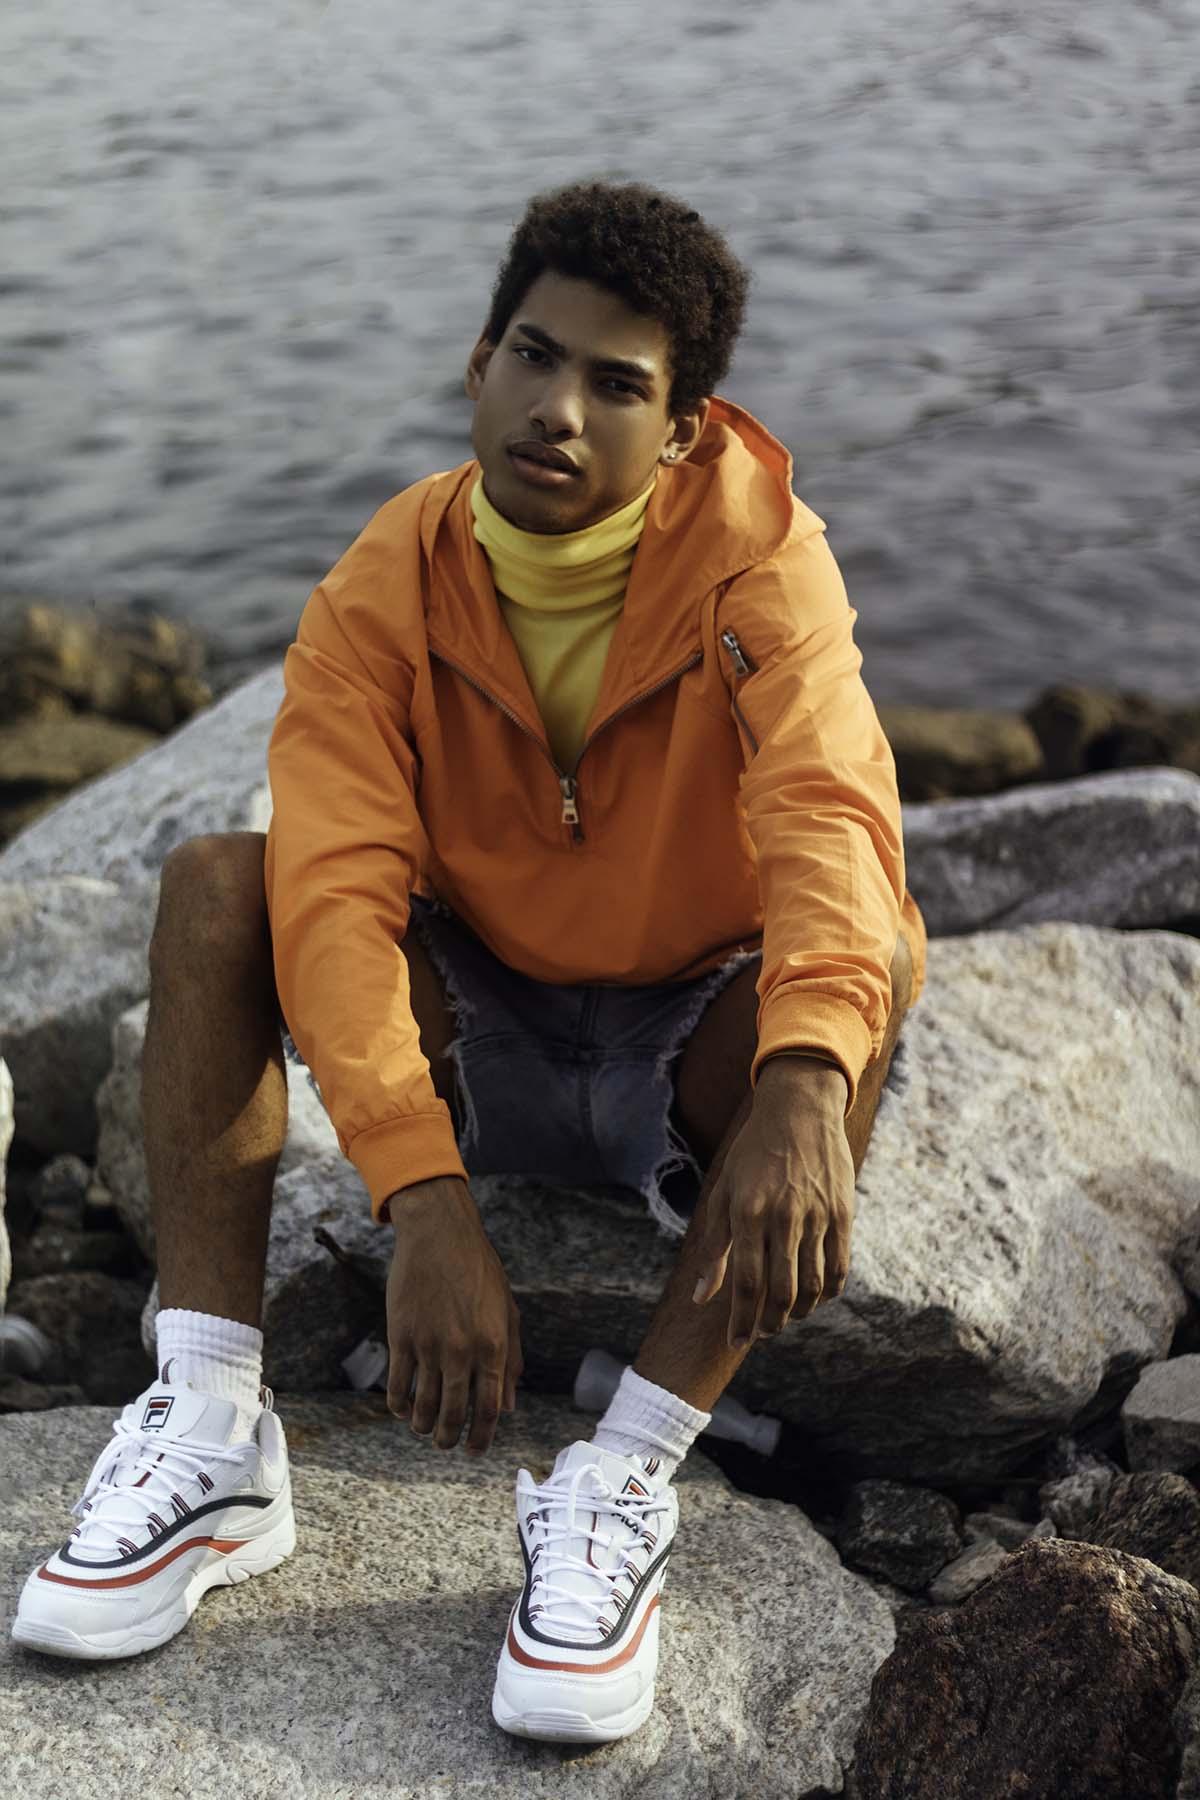 Vinicius Albuquerque by Rodrigo Almeida for Brazilian Male Model